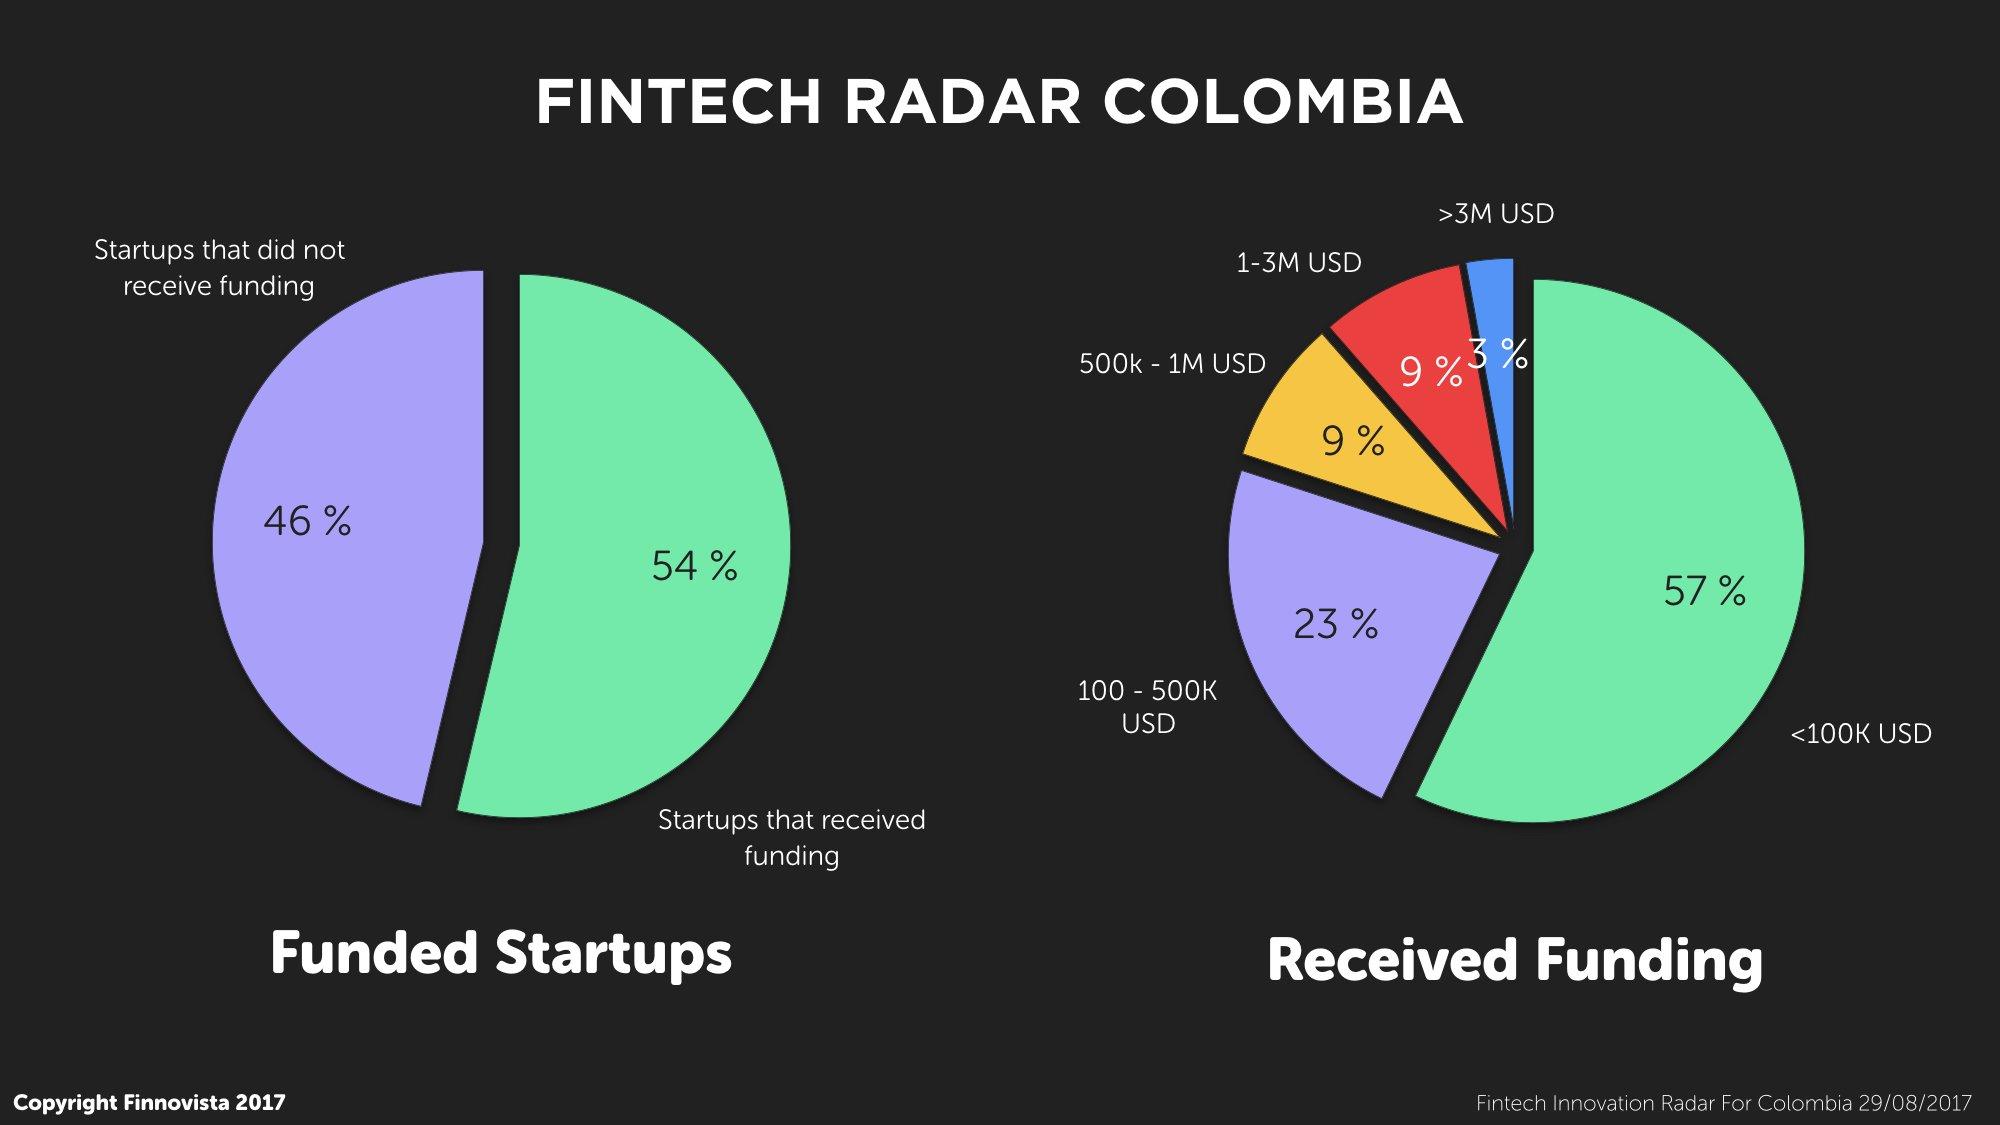 9-Fintech-Radar-Col-Funding.001